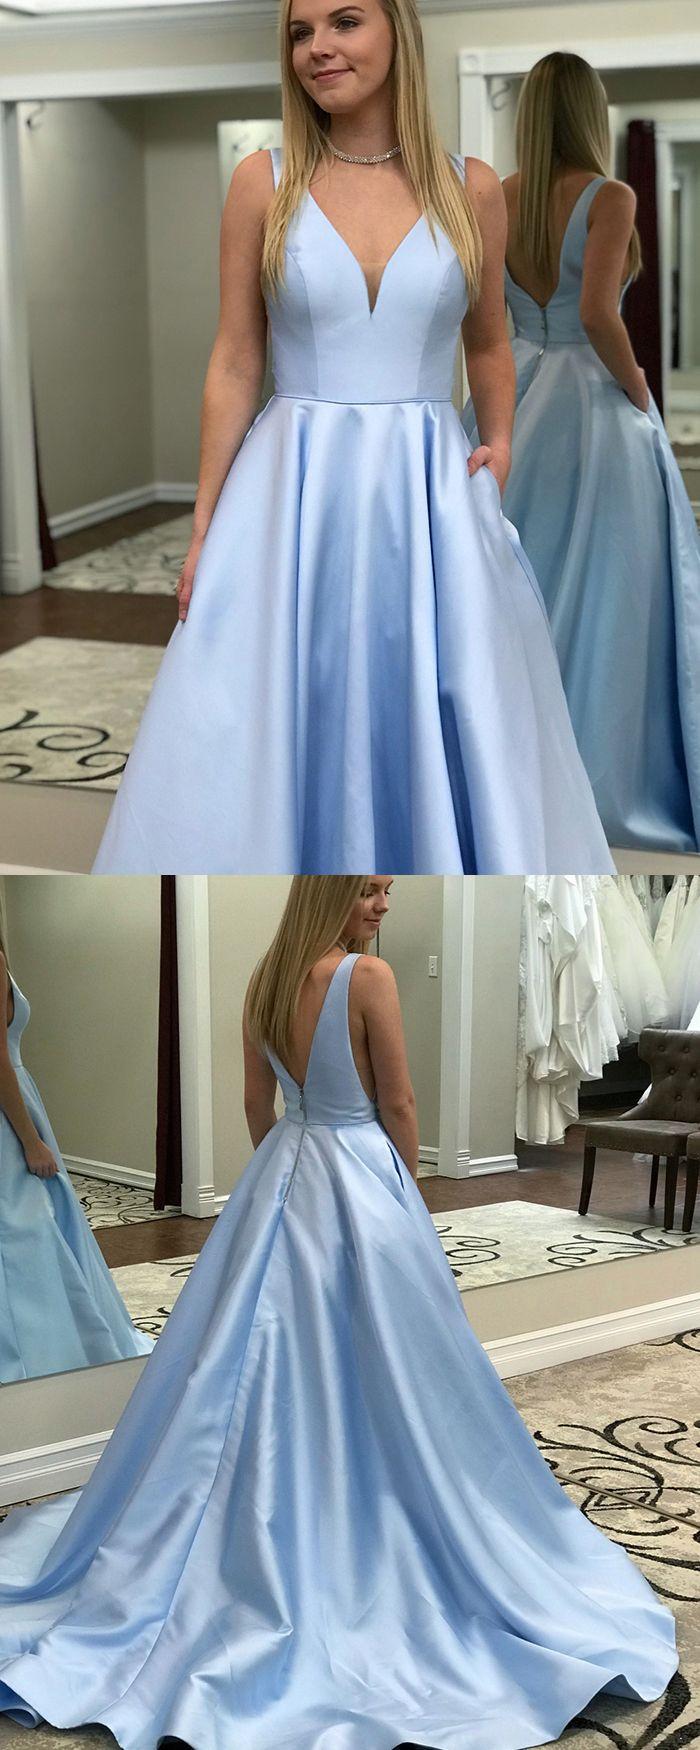 Simple Sky Blue V Neck Satin Long Prom Dress With Pockets Pd1503 Light Blue Prom Dress Prom Dresses Long Blue Light Blue Prom Dress Long